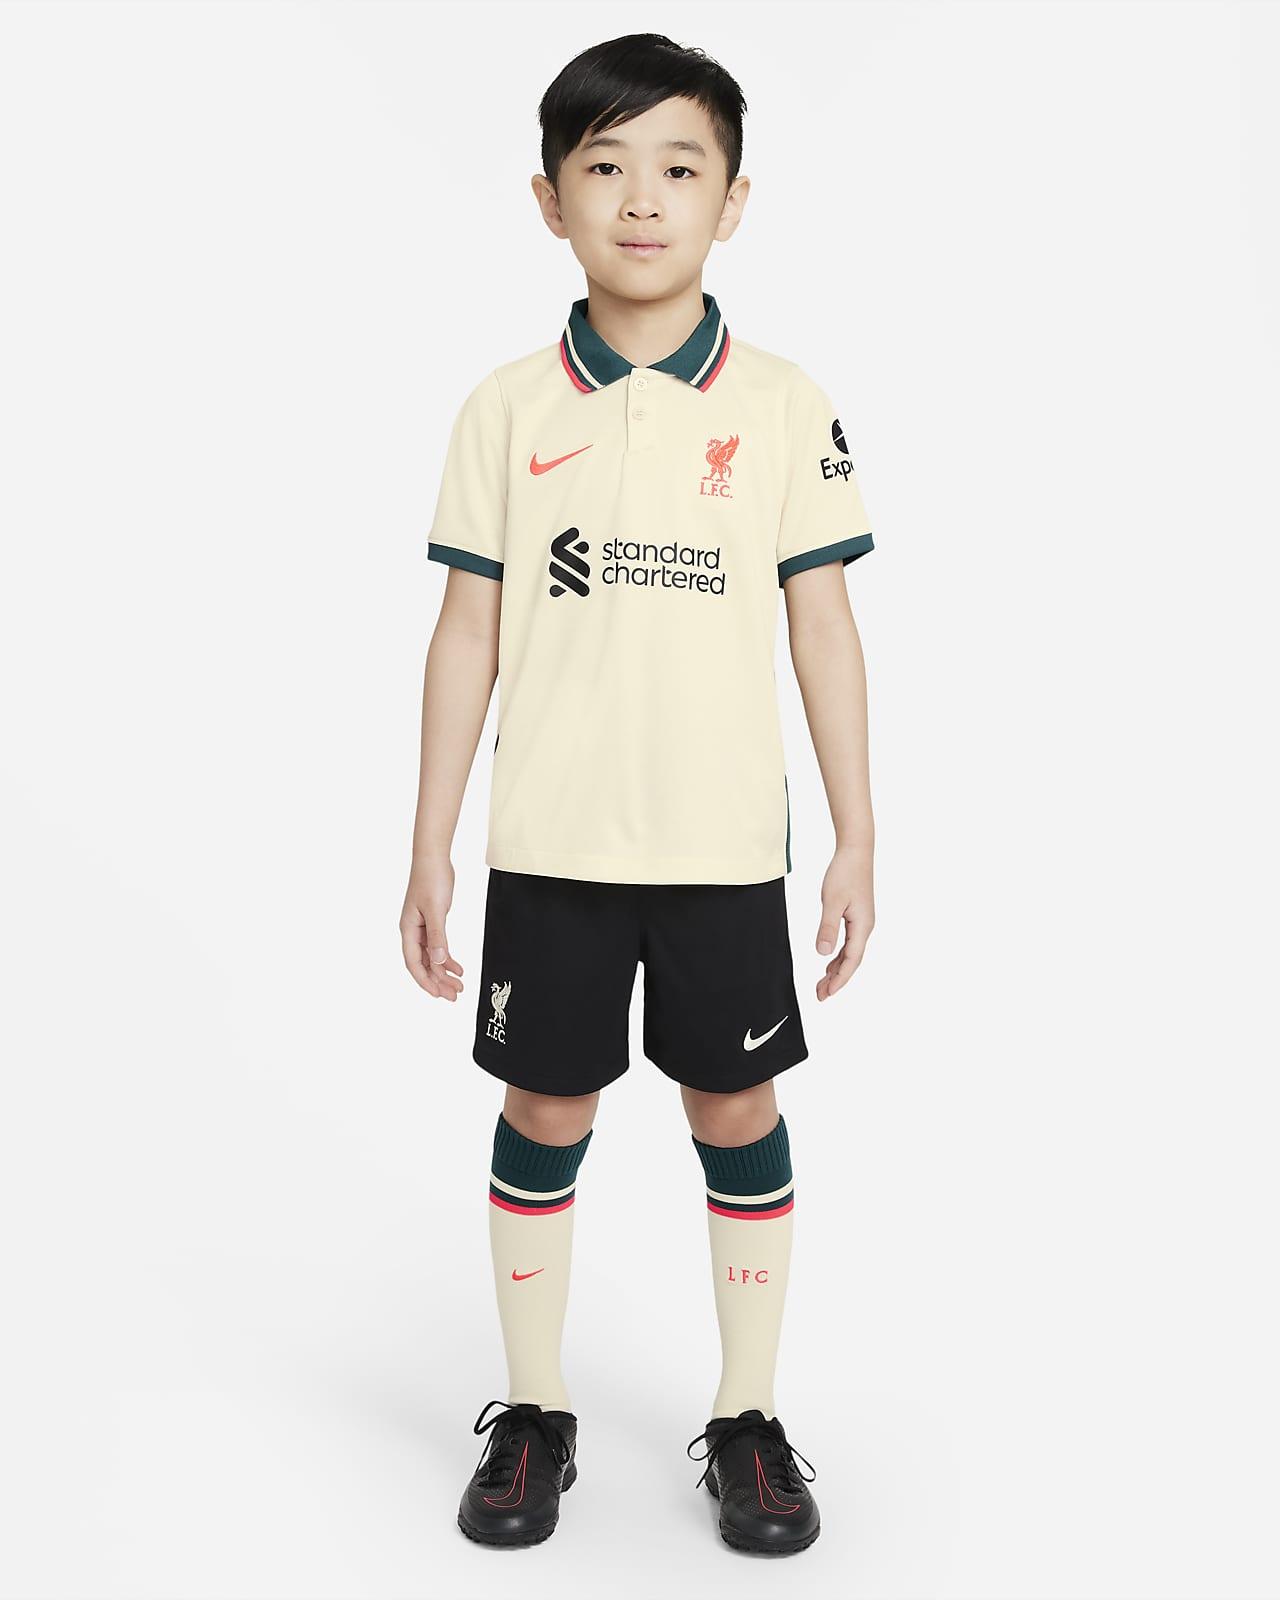 Liverpool FC 2021/22 Away Fußballtrikot-Set für jüngere Kinder